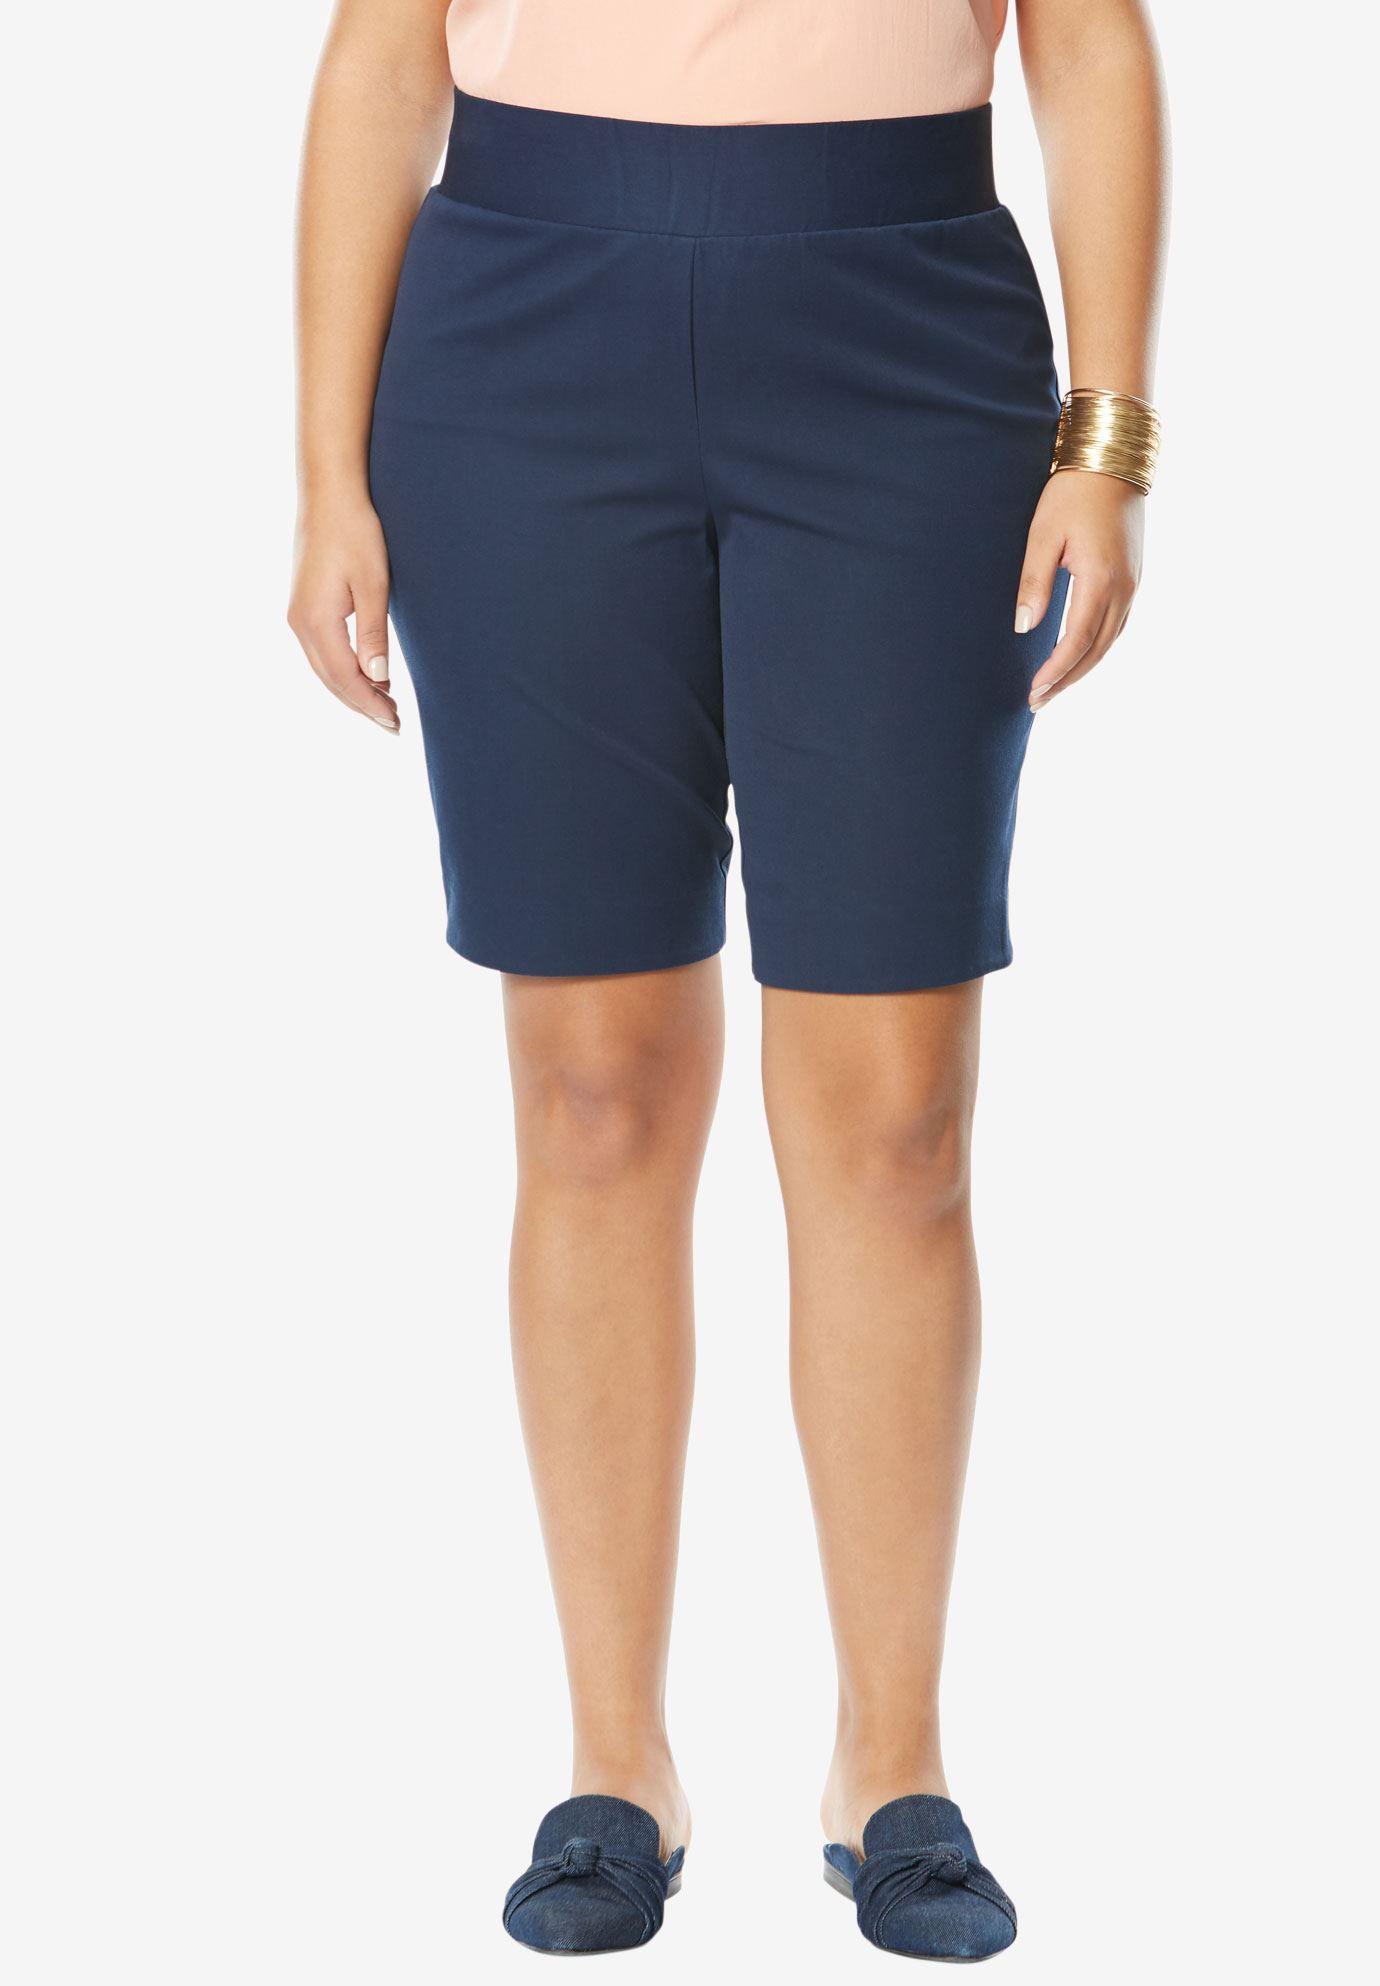 36e3d7b17fa21 Tummy Control Twill Shorts | Plus Size Capris & Shorts | Jessica London